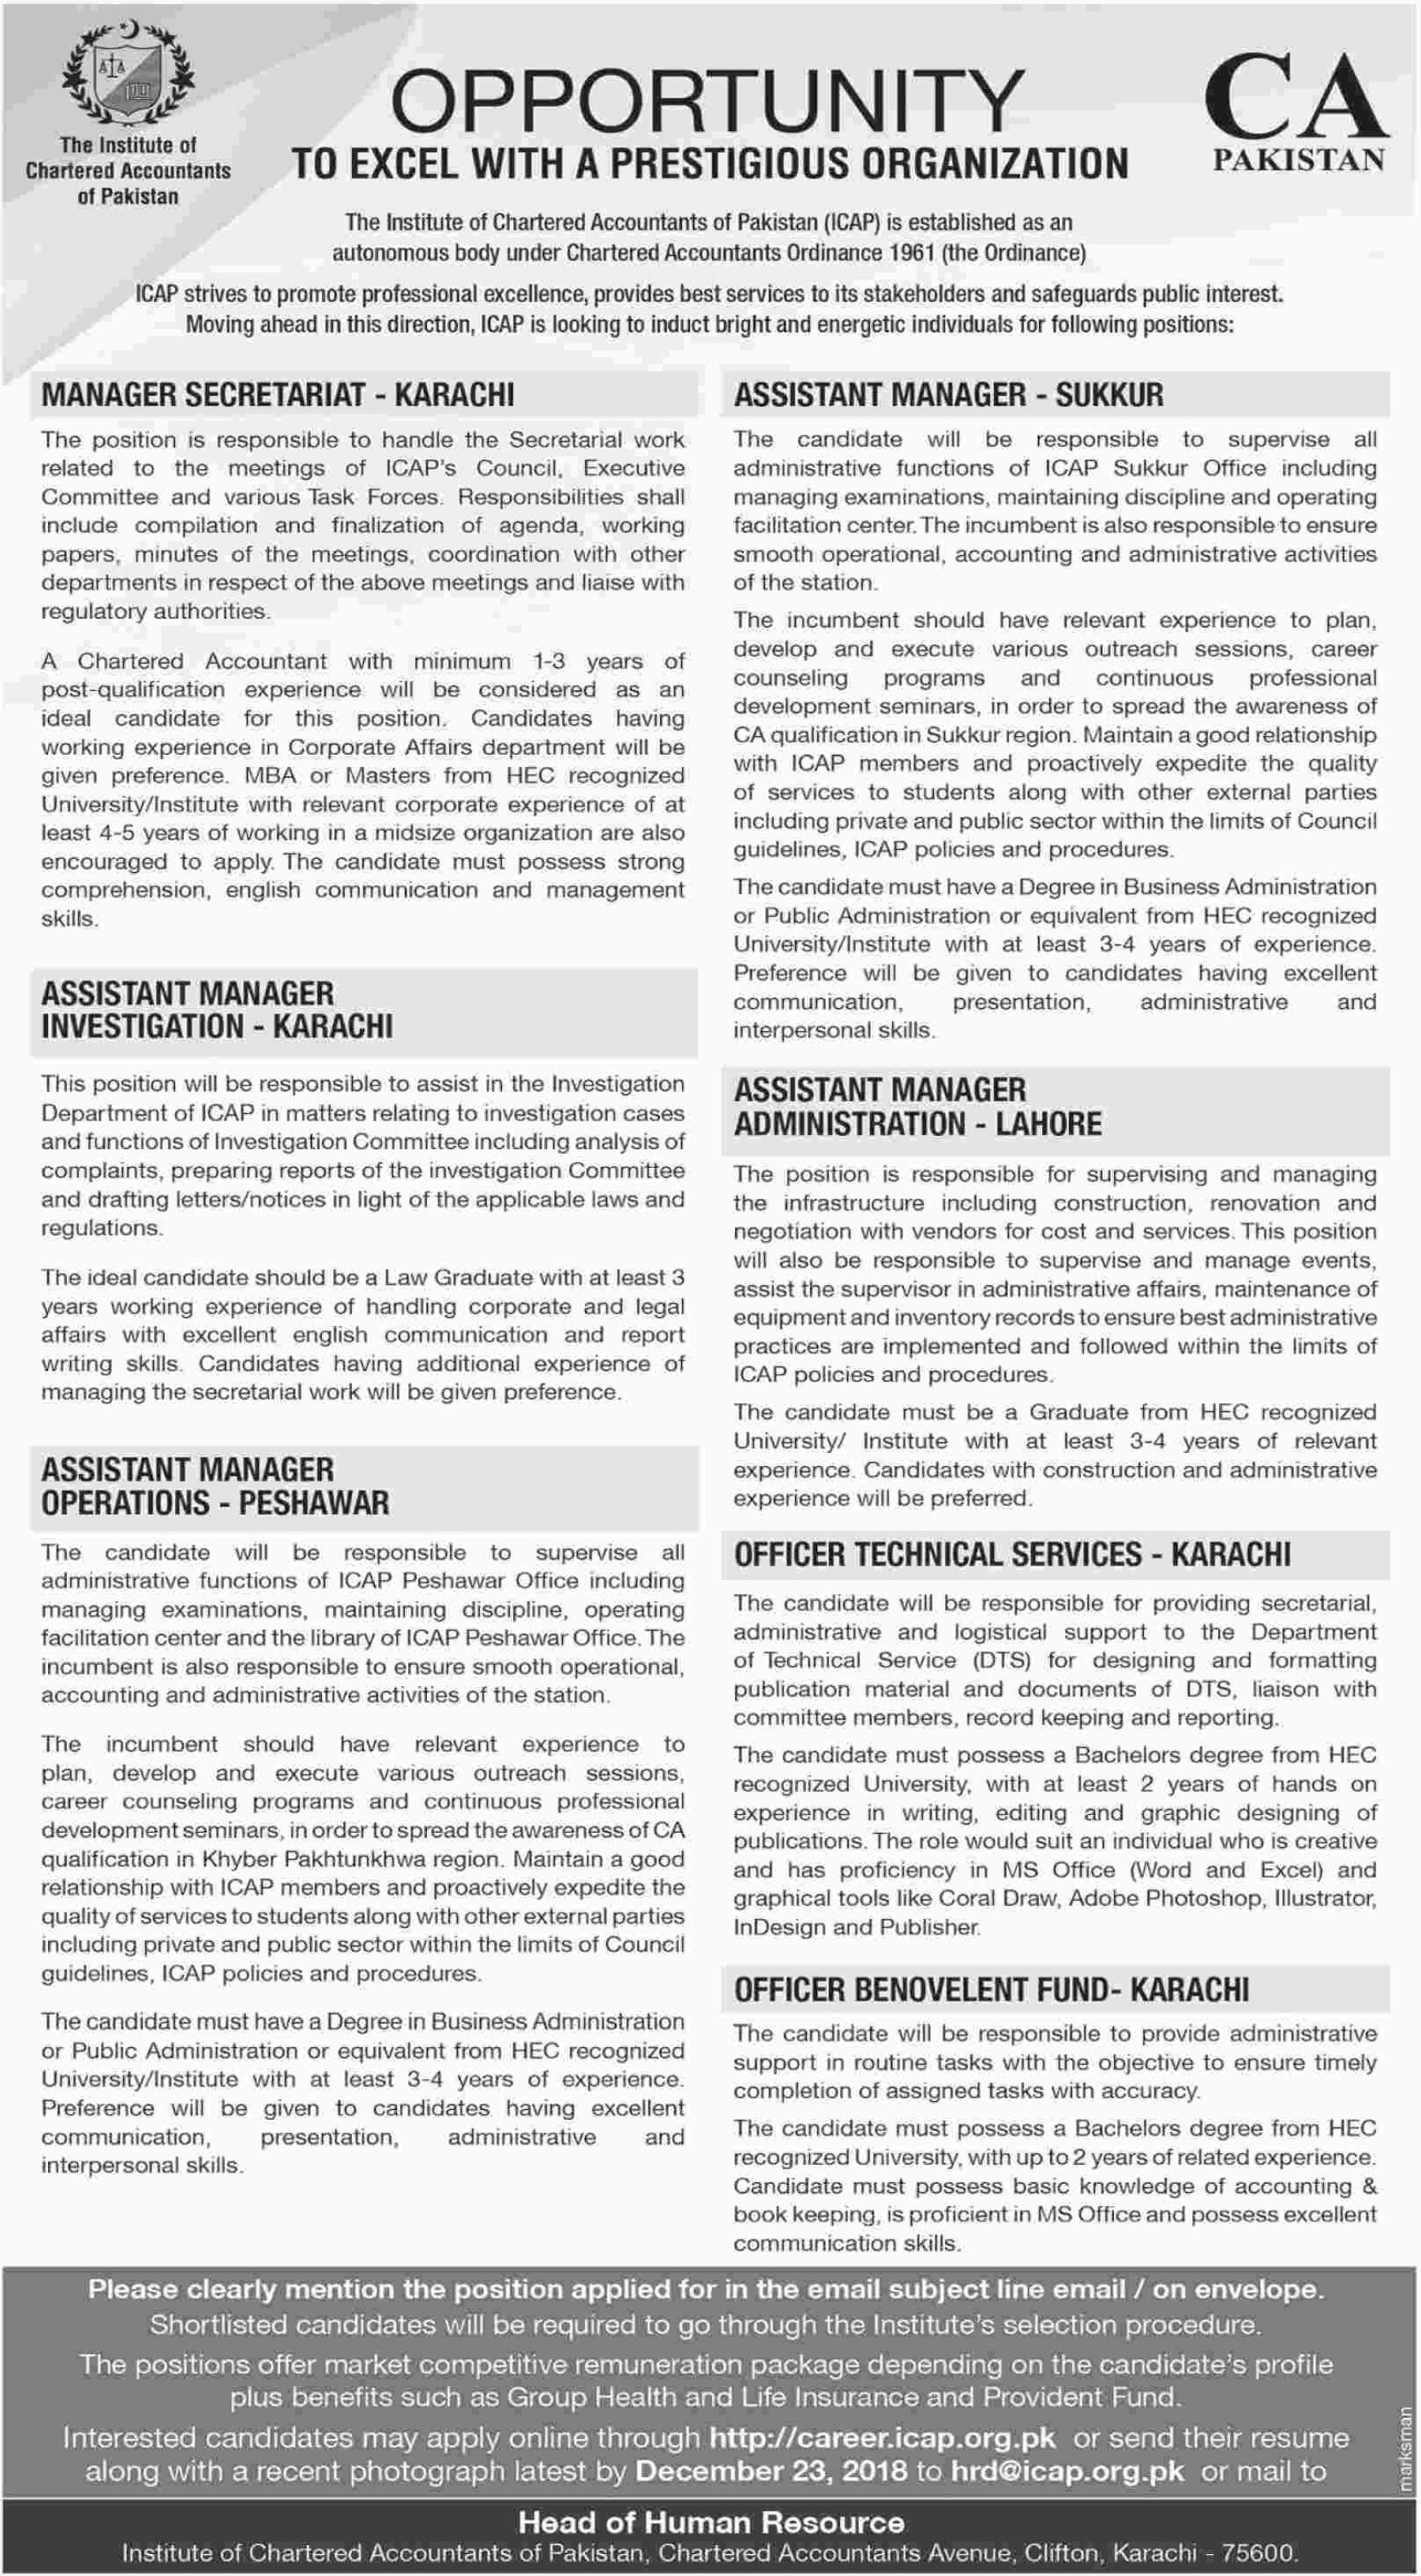 CA Pakistan Manager Secretariat Jobs 2019